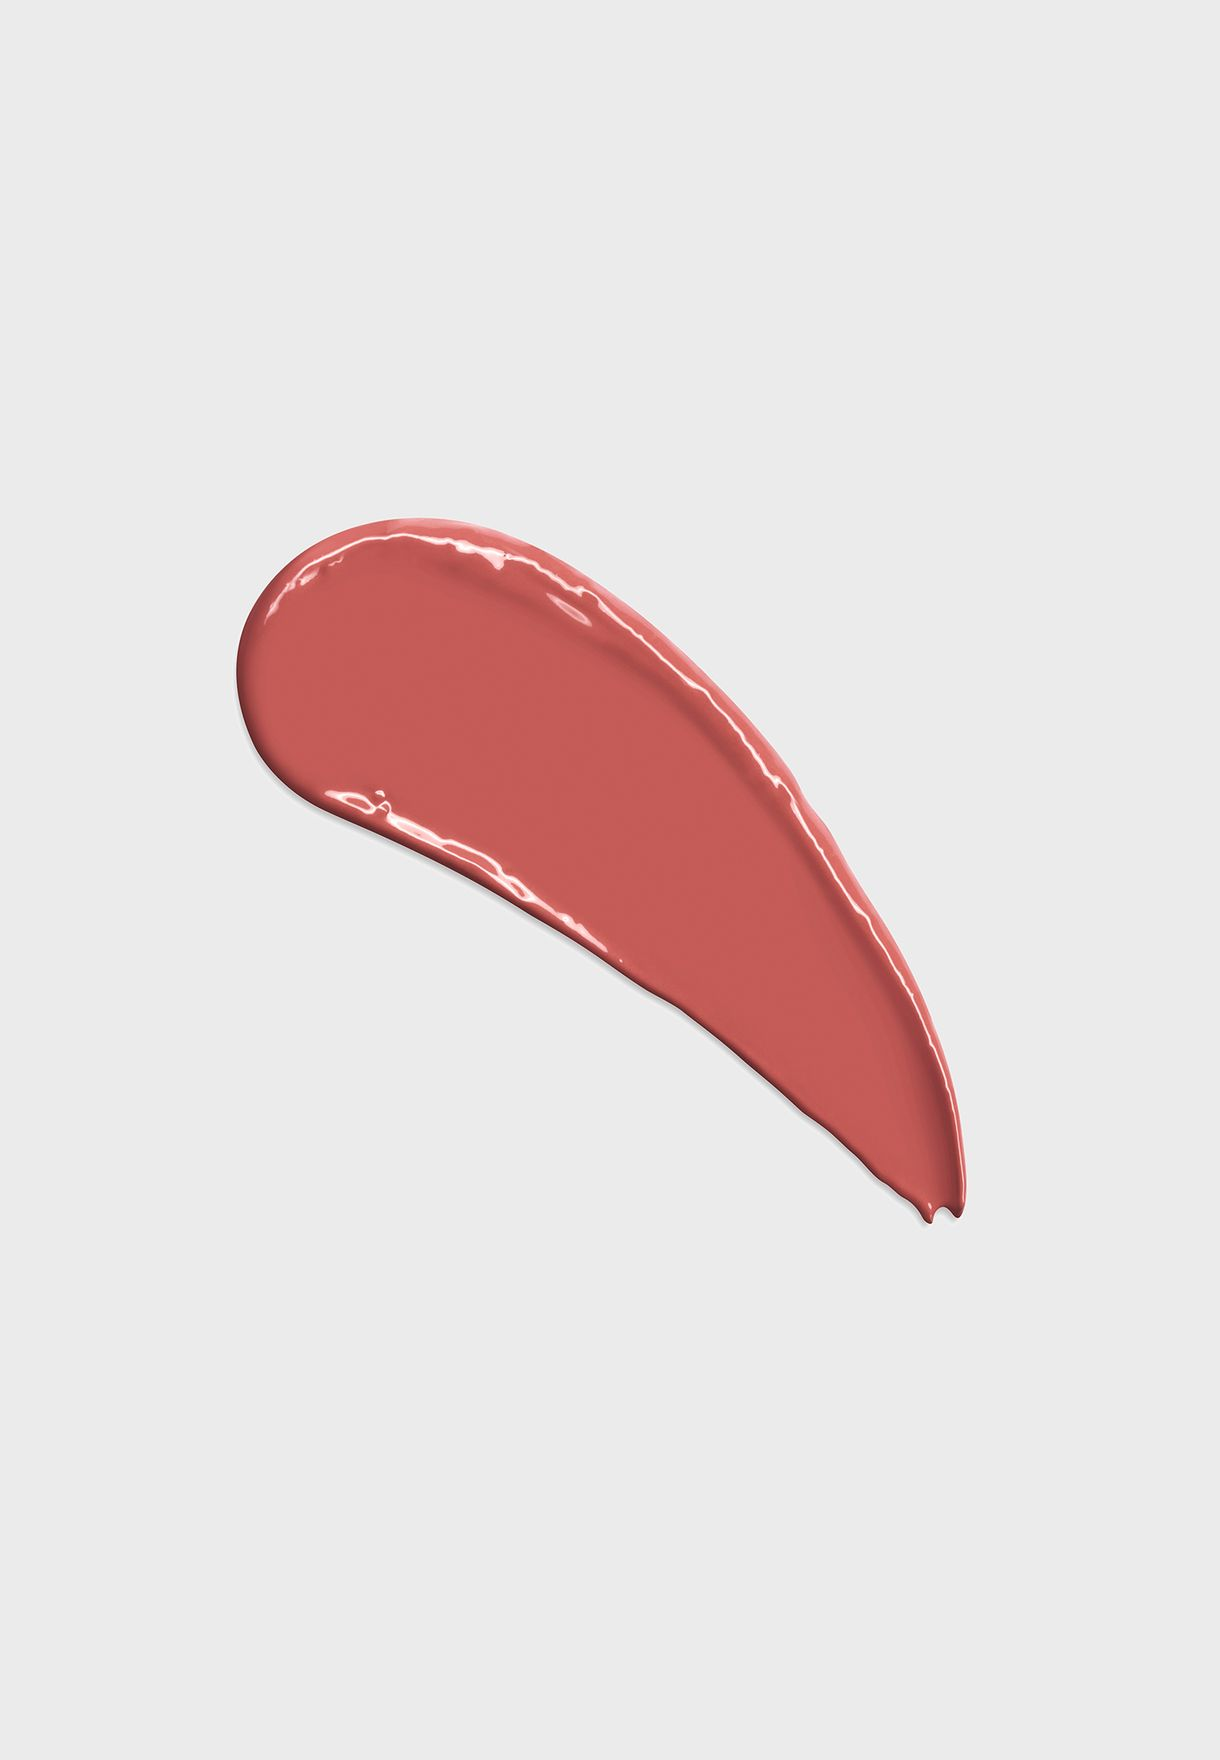 HotLips #2 Lipstick - Glowing Jen